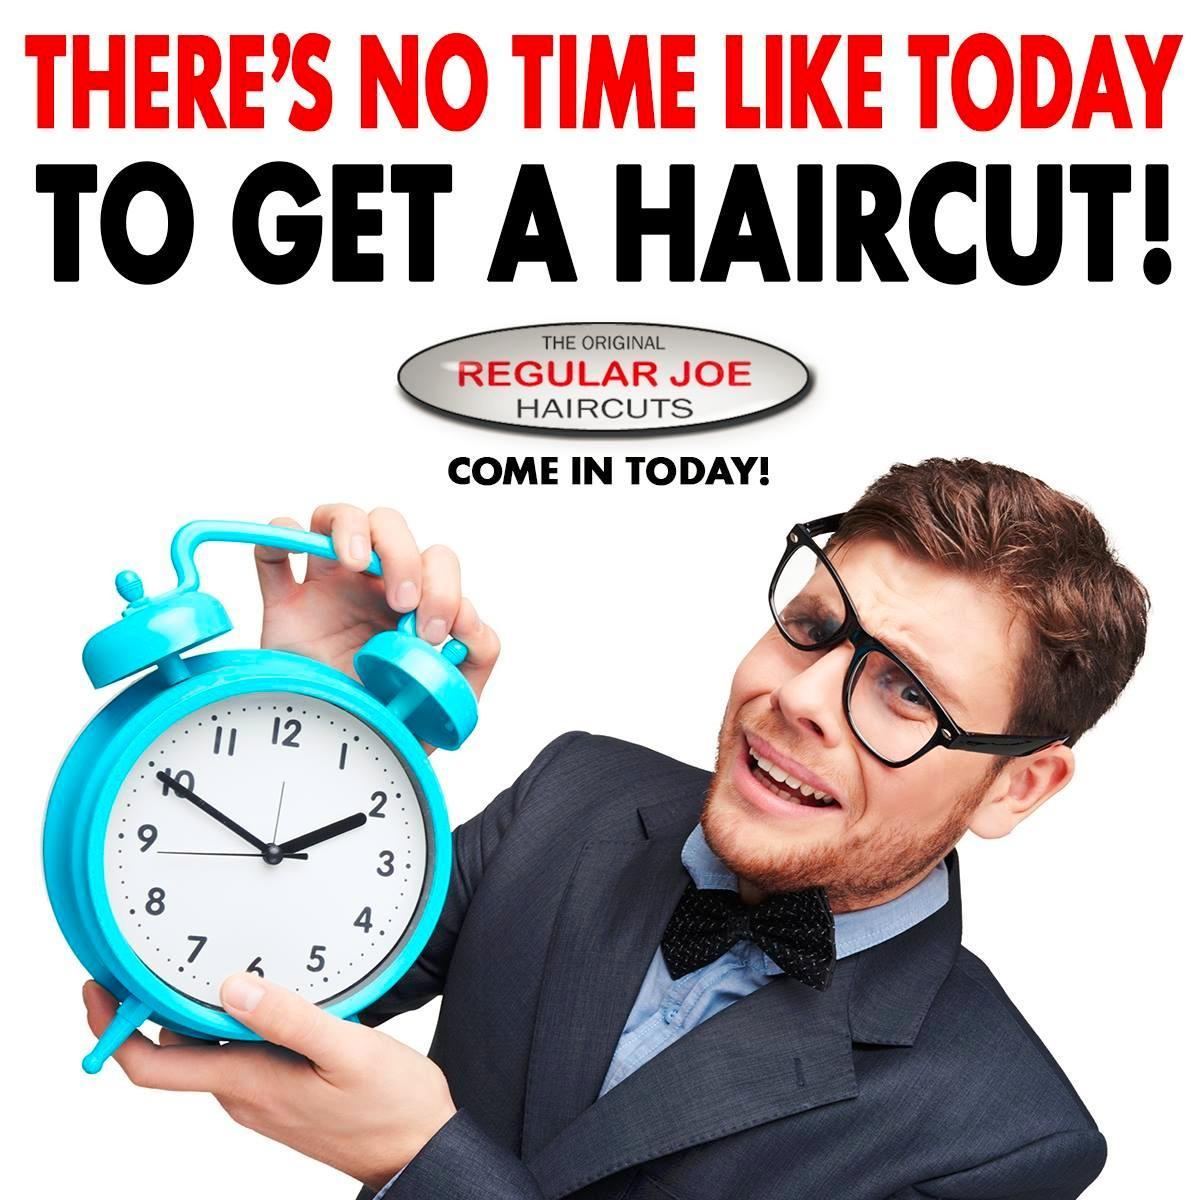 Barber Shop Fort Bliss : Regular Joe Haircuts in El Paso, TX 79936 - ChamberofCommerce.com